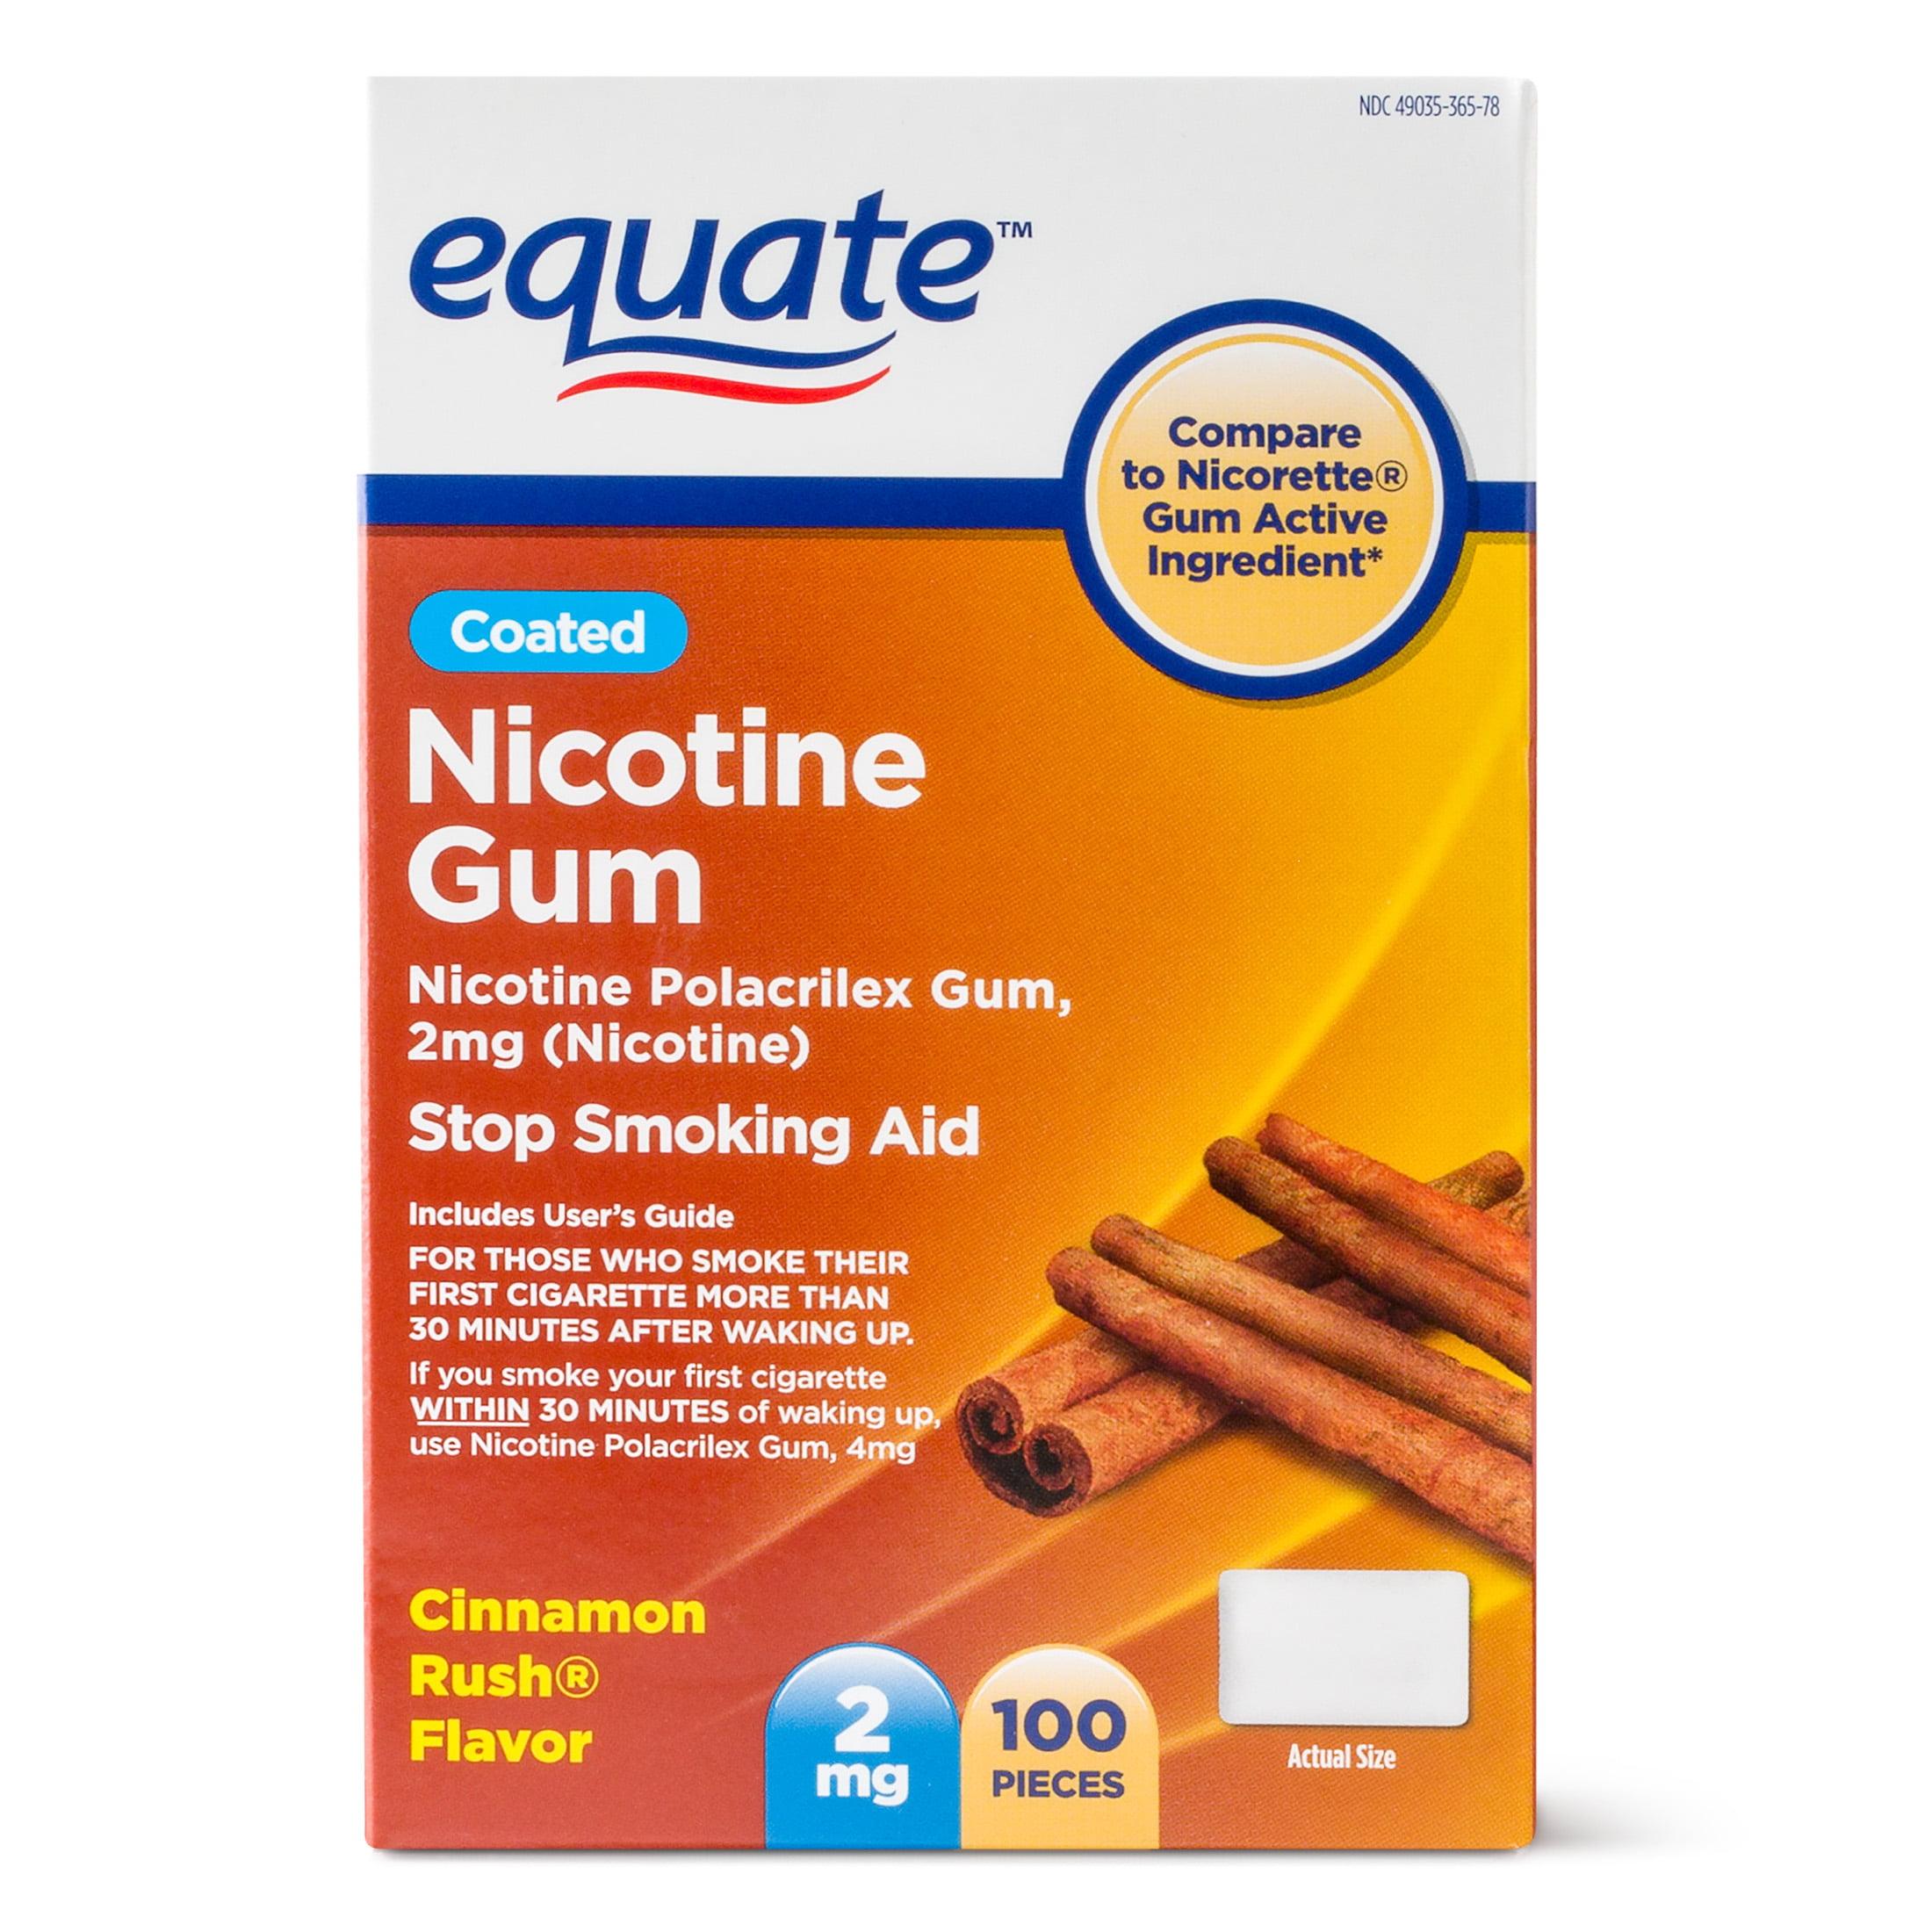 Equate Coated Nicotine Gum Stop Smoking Aid Cinnamon Rush Flavor, 2 mg, 100 Ct